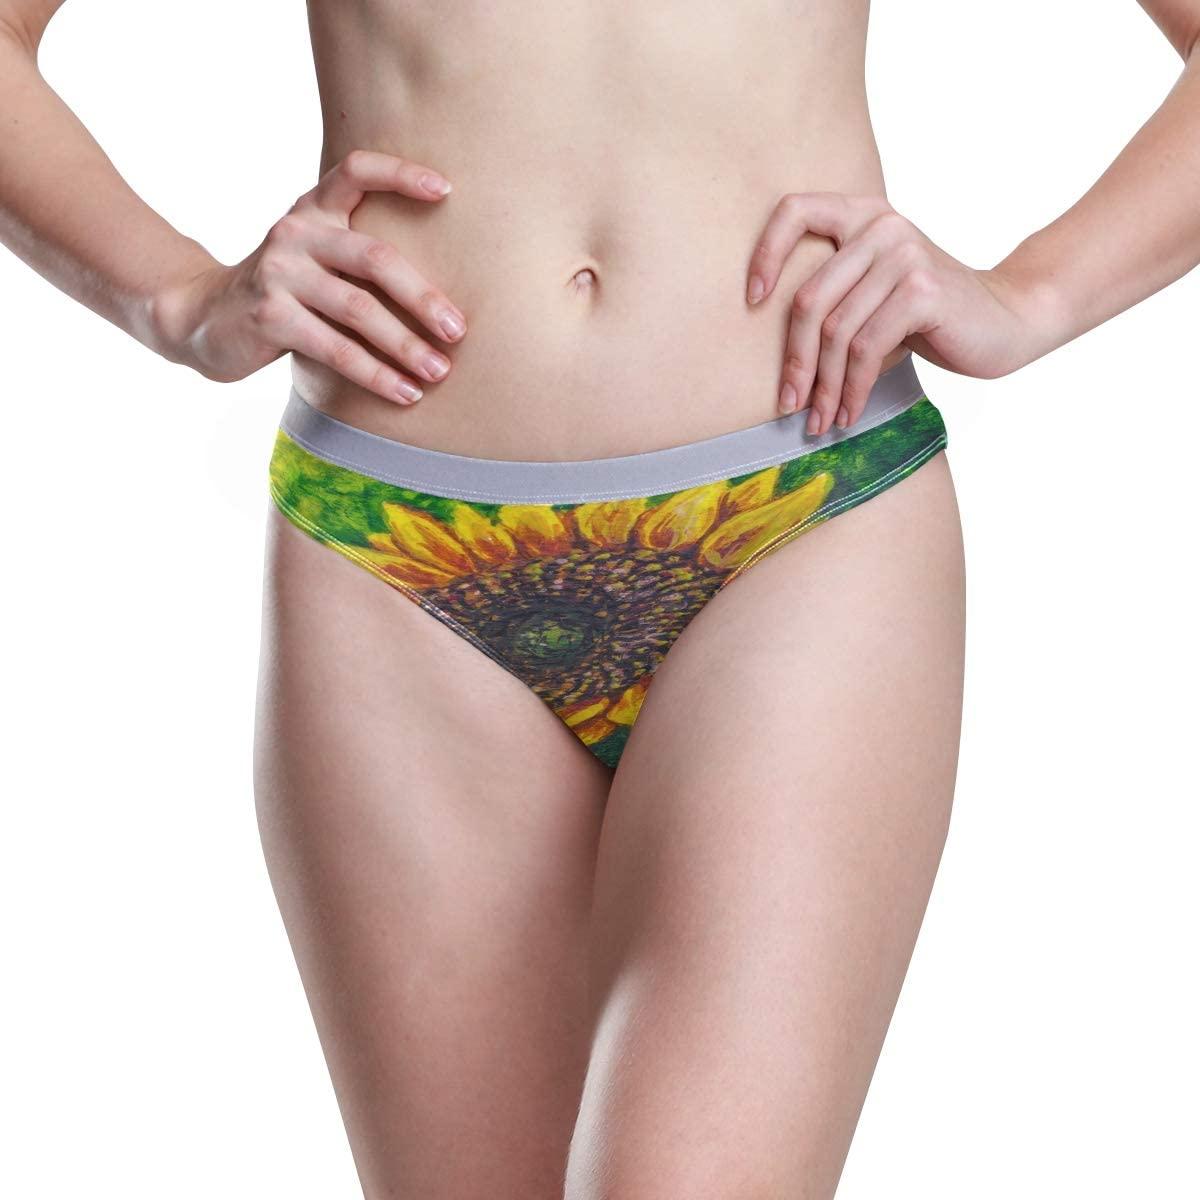 Womens Underwear Sexy Panties Sunflower with Seeds On The Farm Ladies High Cut Bikini Hipster Panty